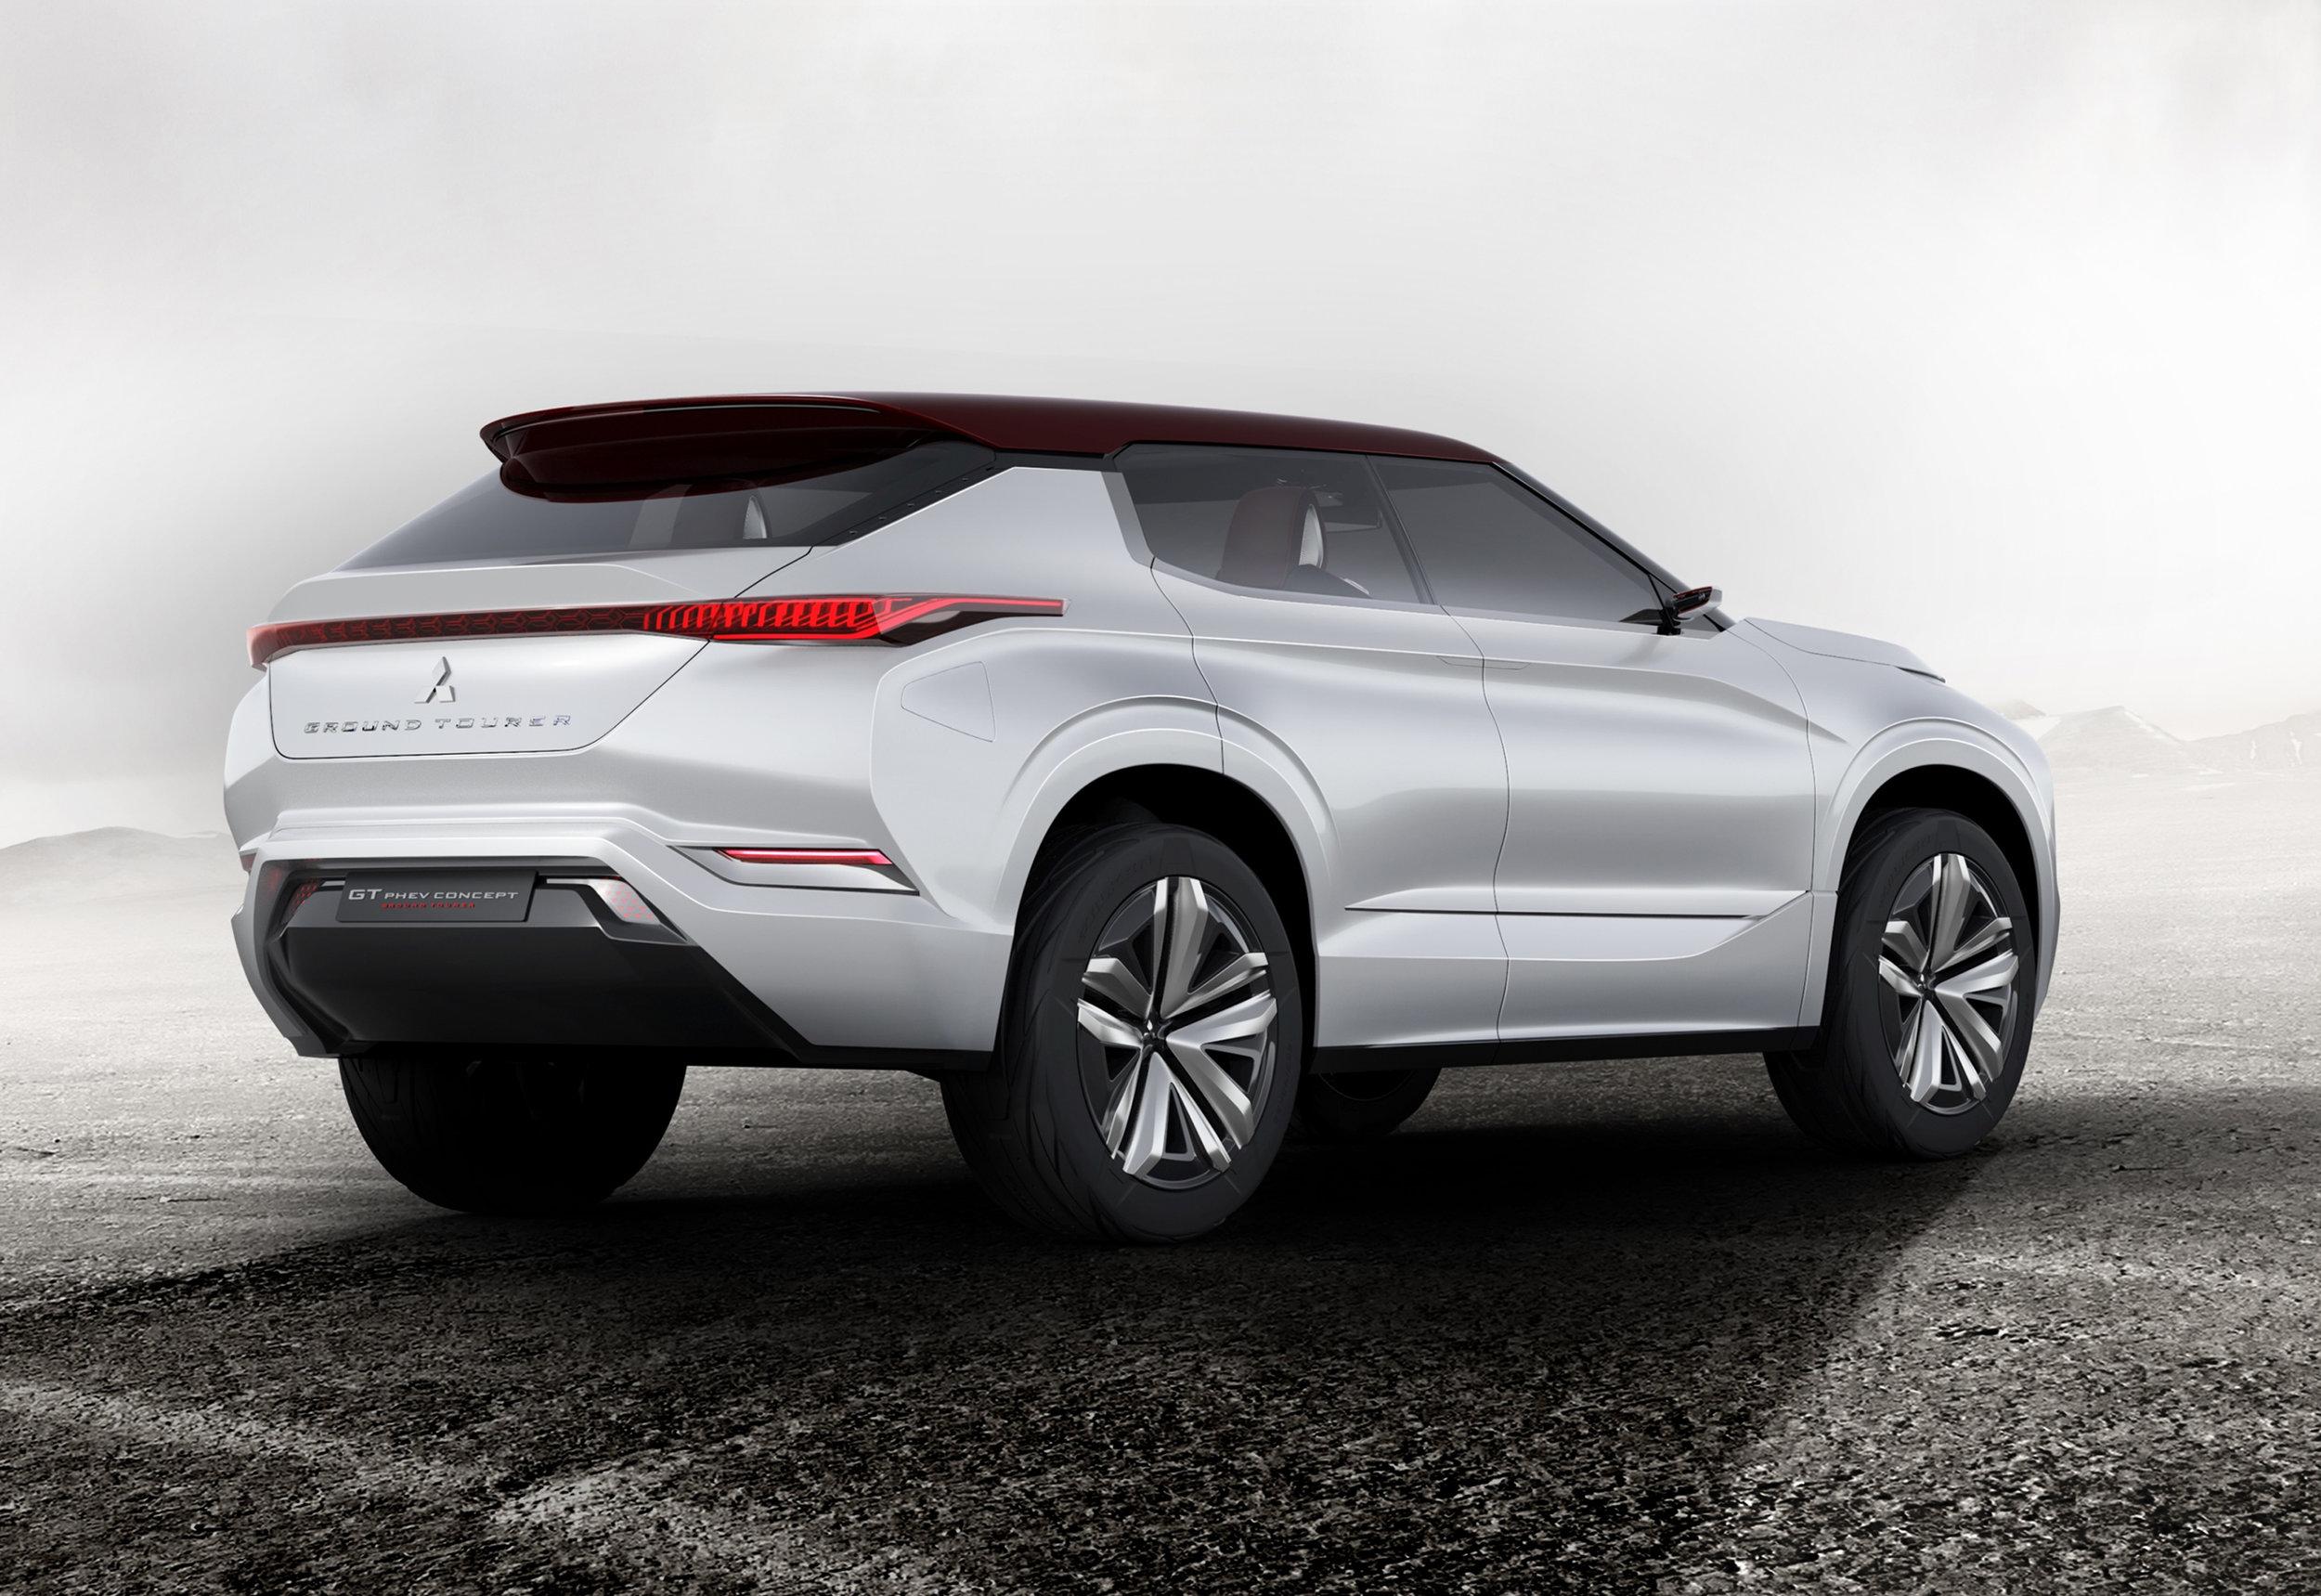 2World-Premiere-of-Ground-Tourer-SUV-Mitsubishi-GT-PHEV-Concept.jpg